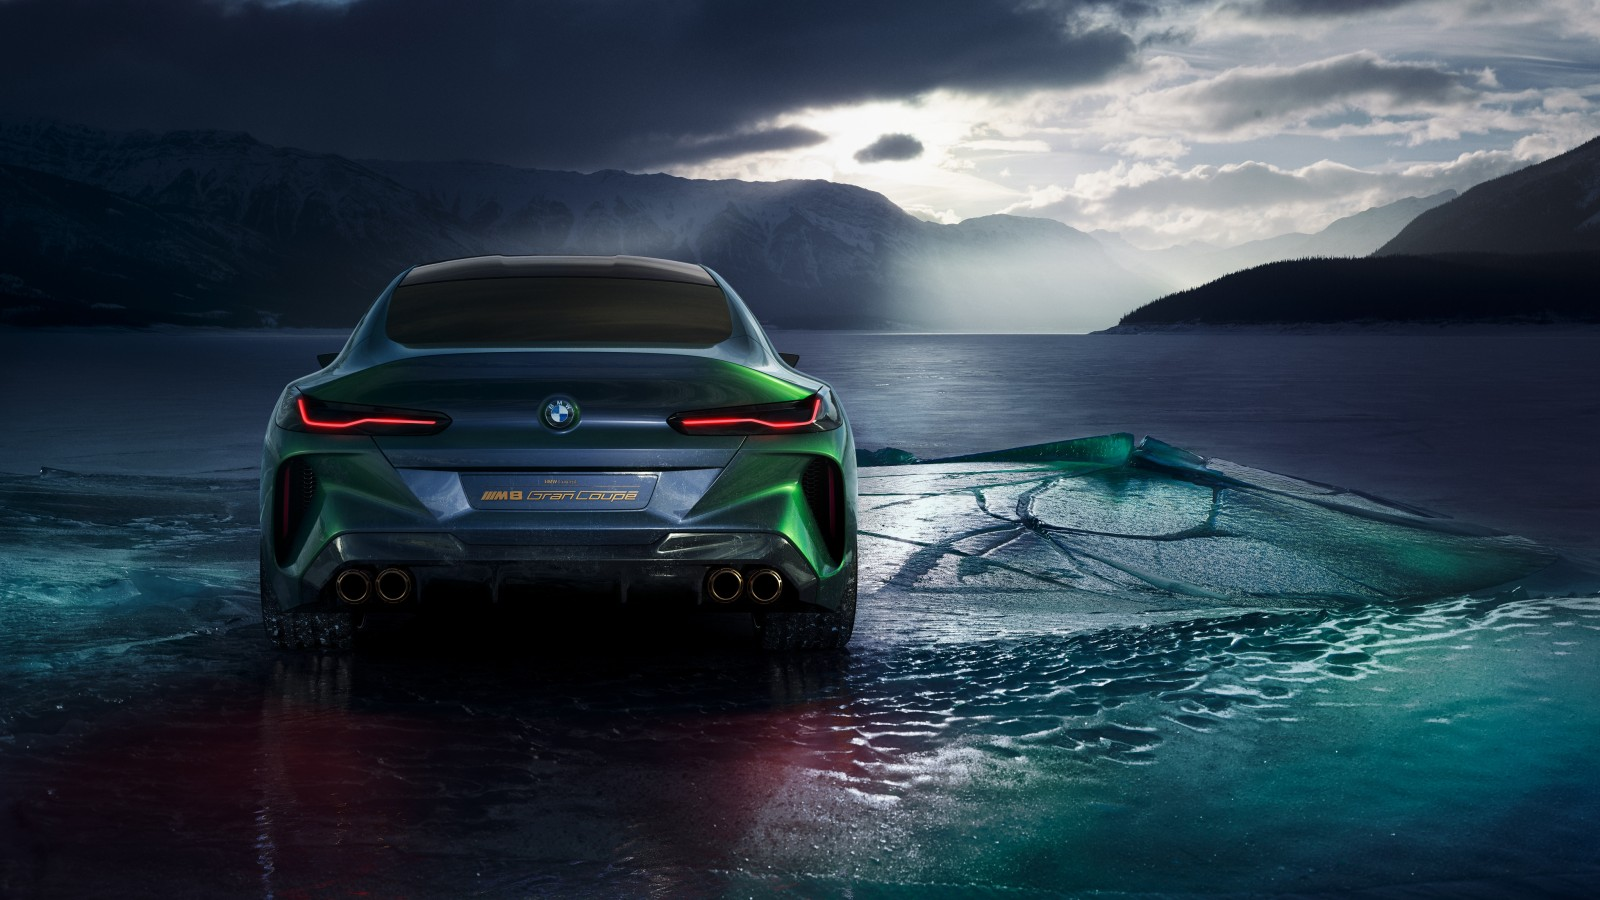 2018 BMW Concept M8 Gran Coupe 4K 5 Wallpaper